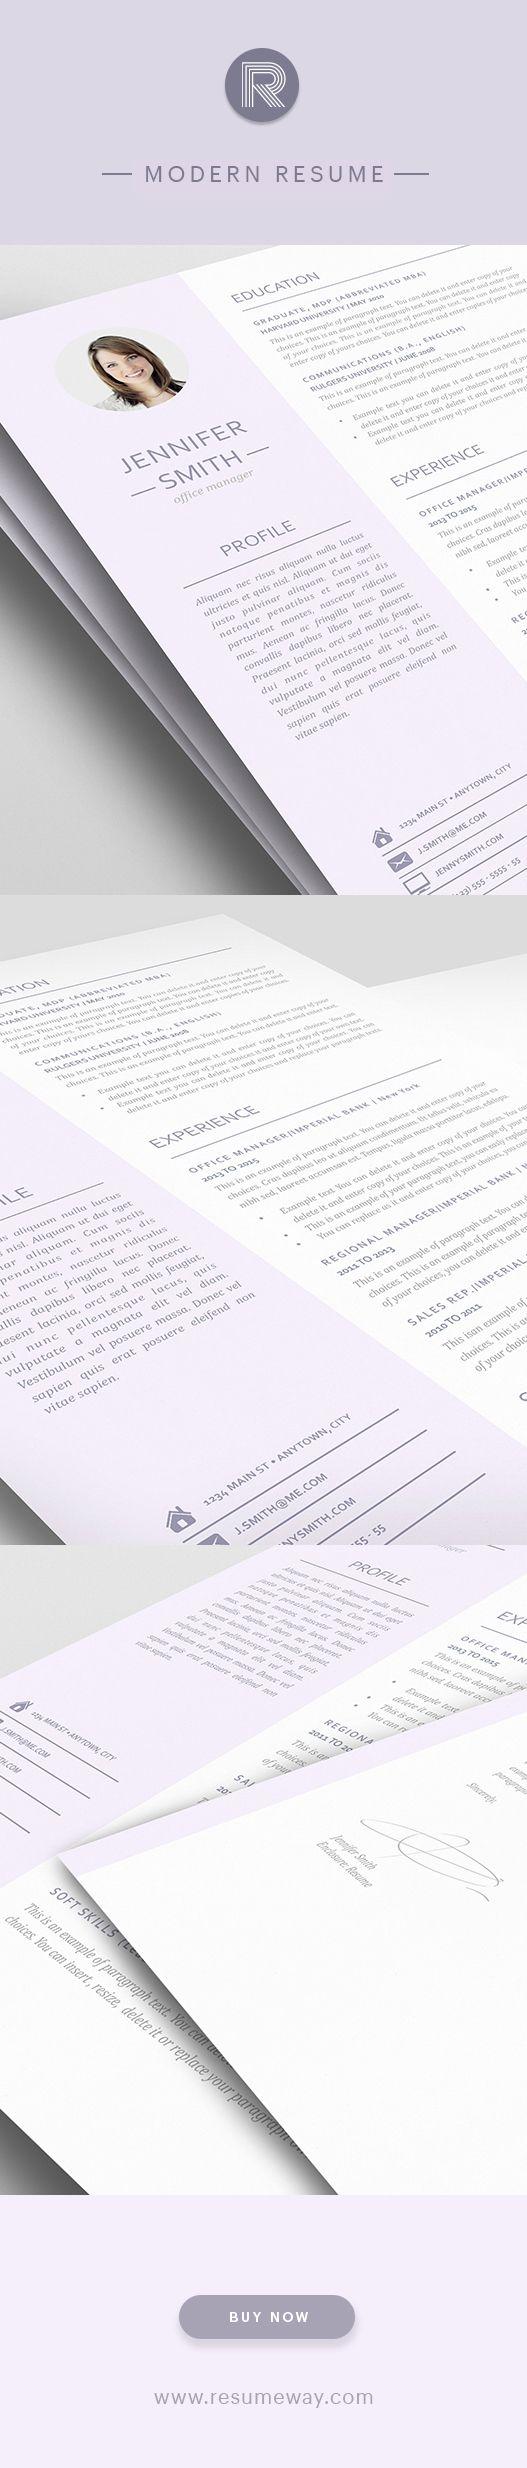 Modern Resume Template 110950 - Premium line of Resume & Cover ...